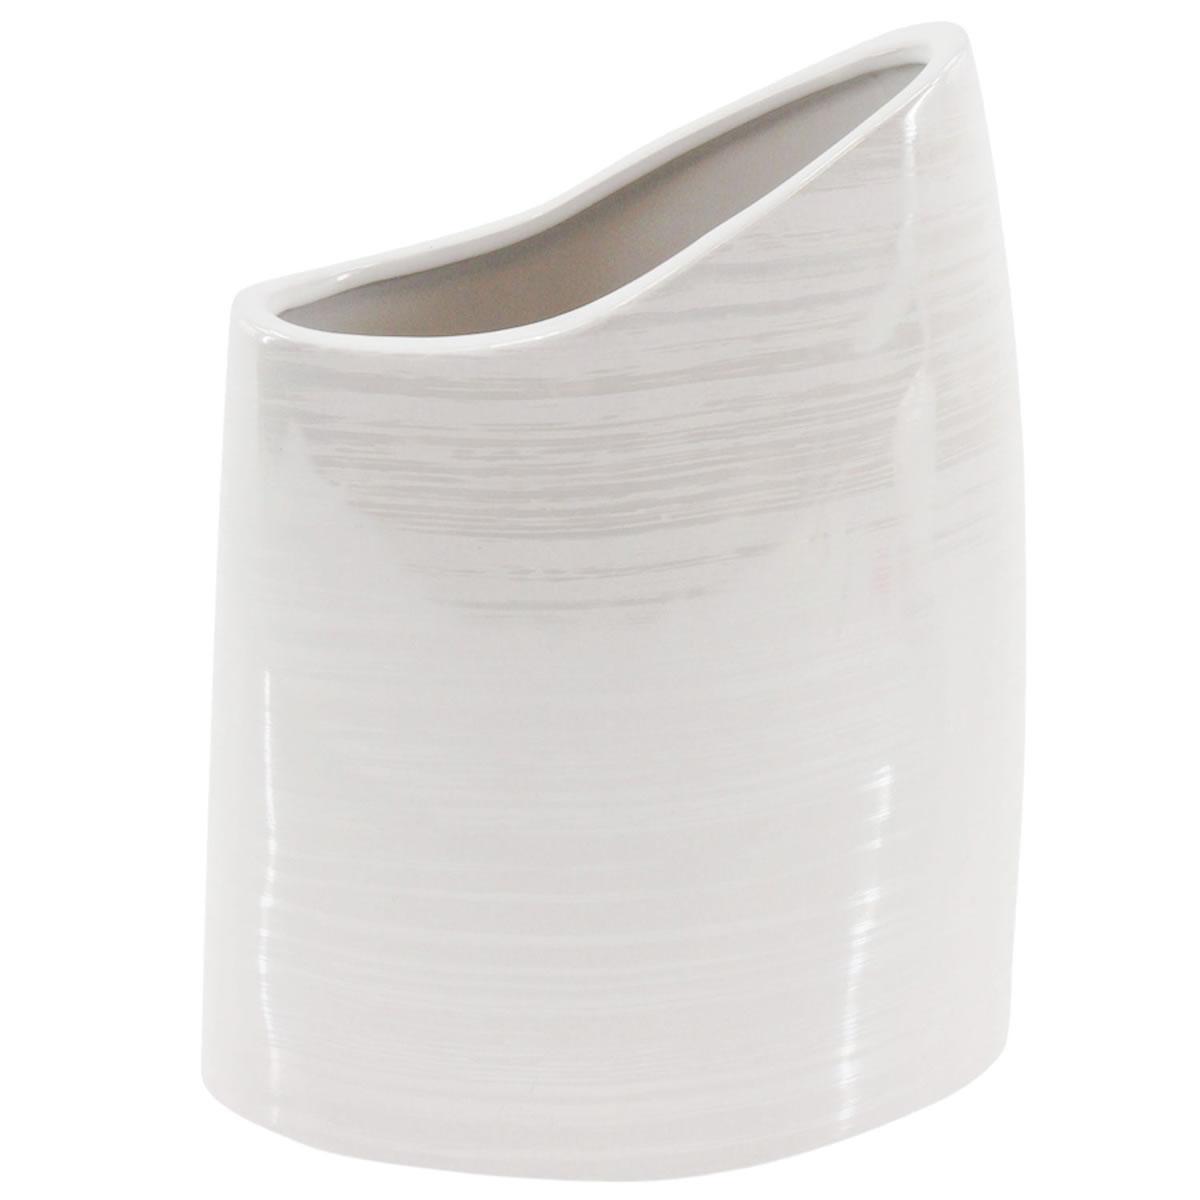 art decor Vase Halbmond, Blumenvase, Keramik, weiß ...